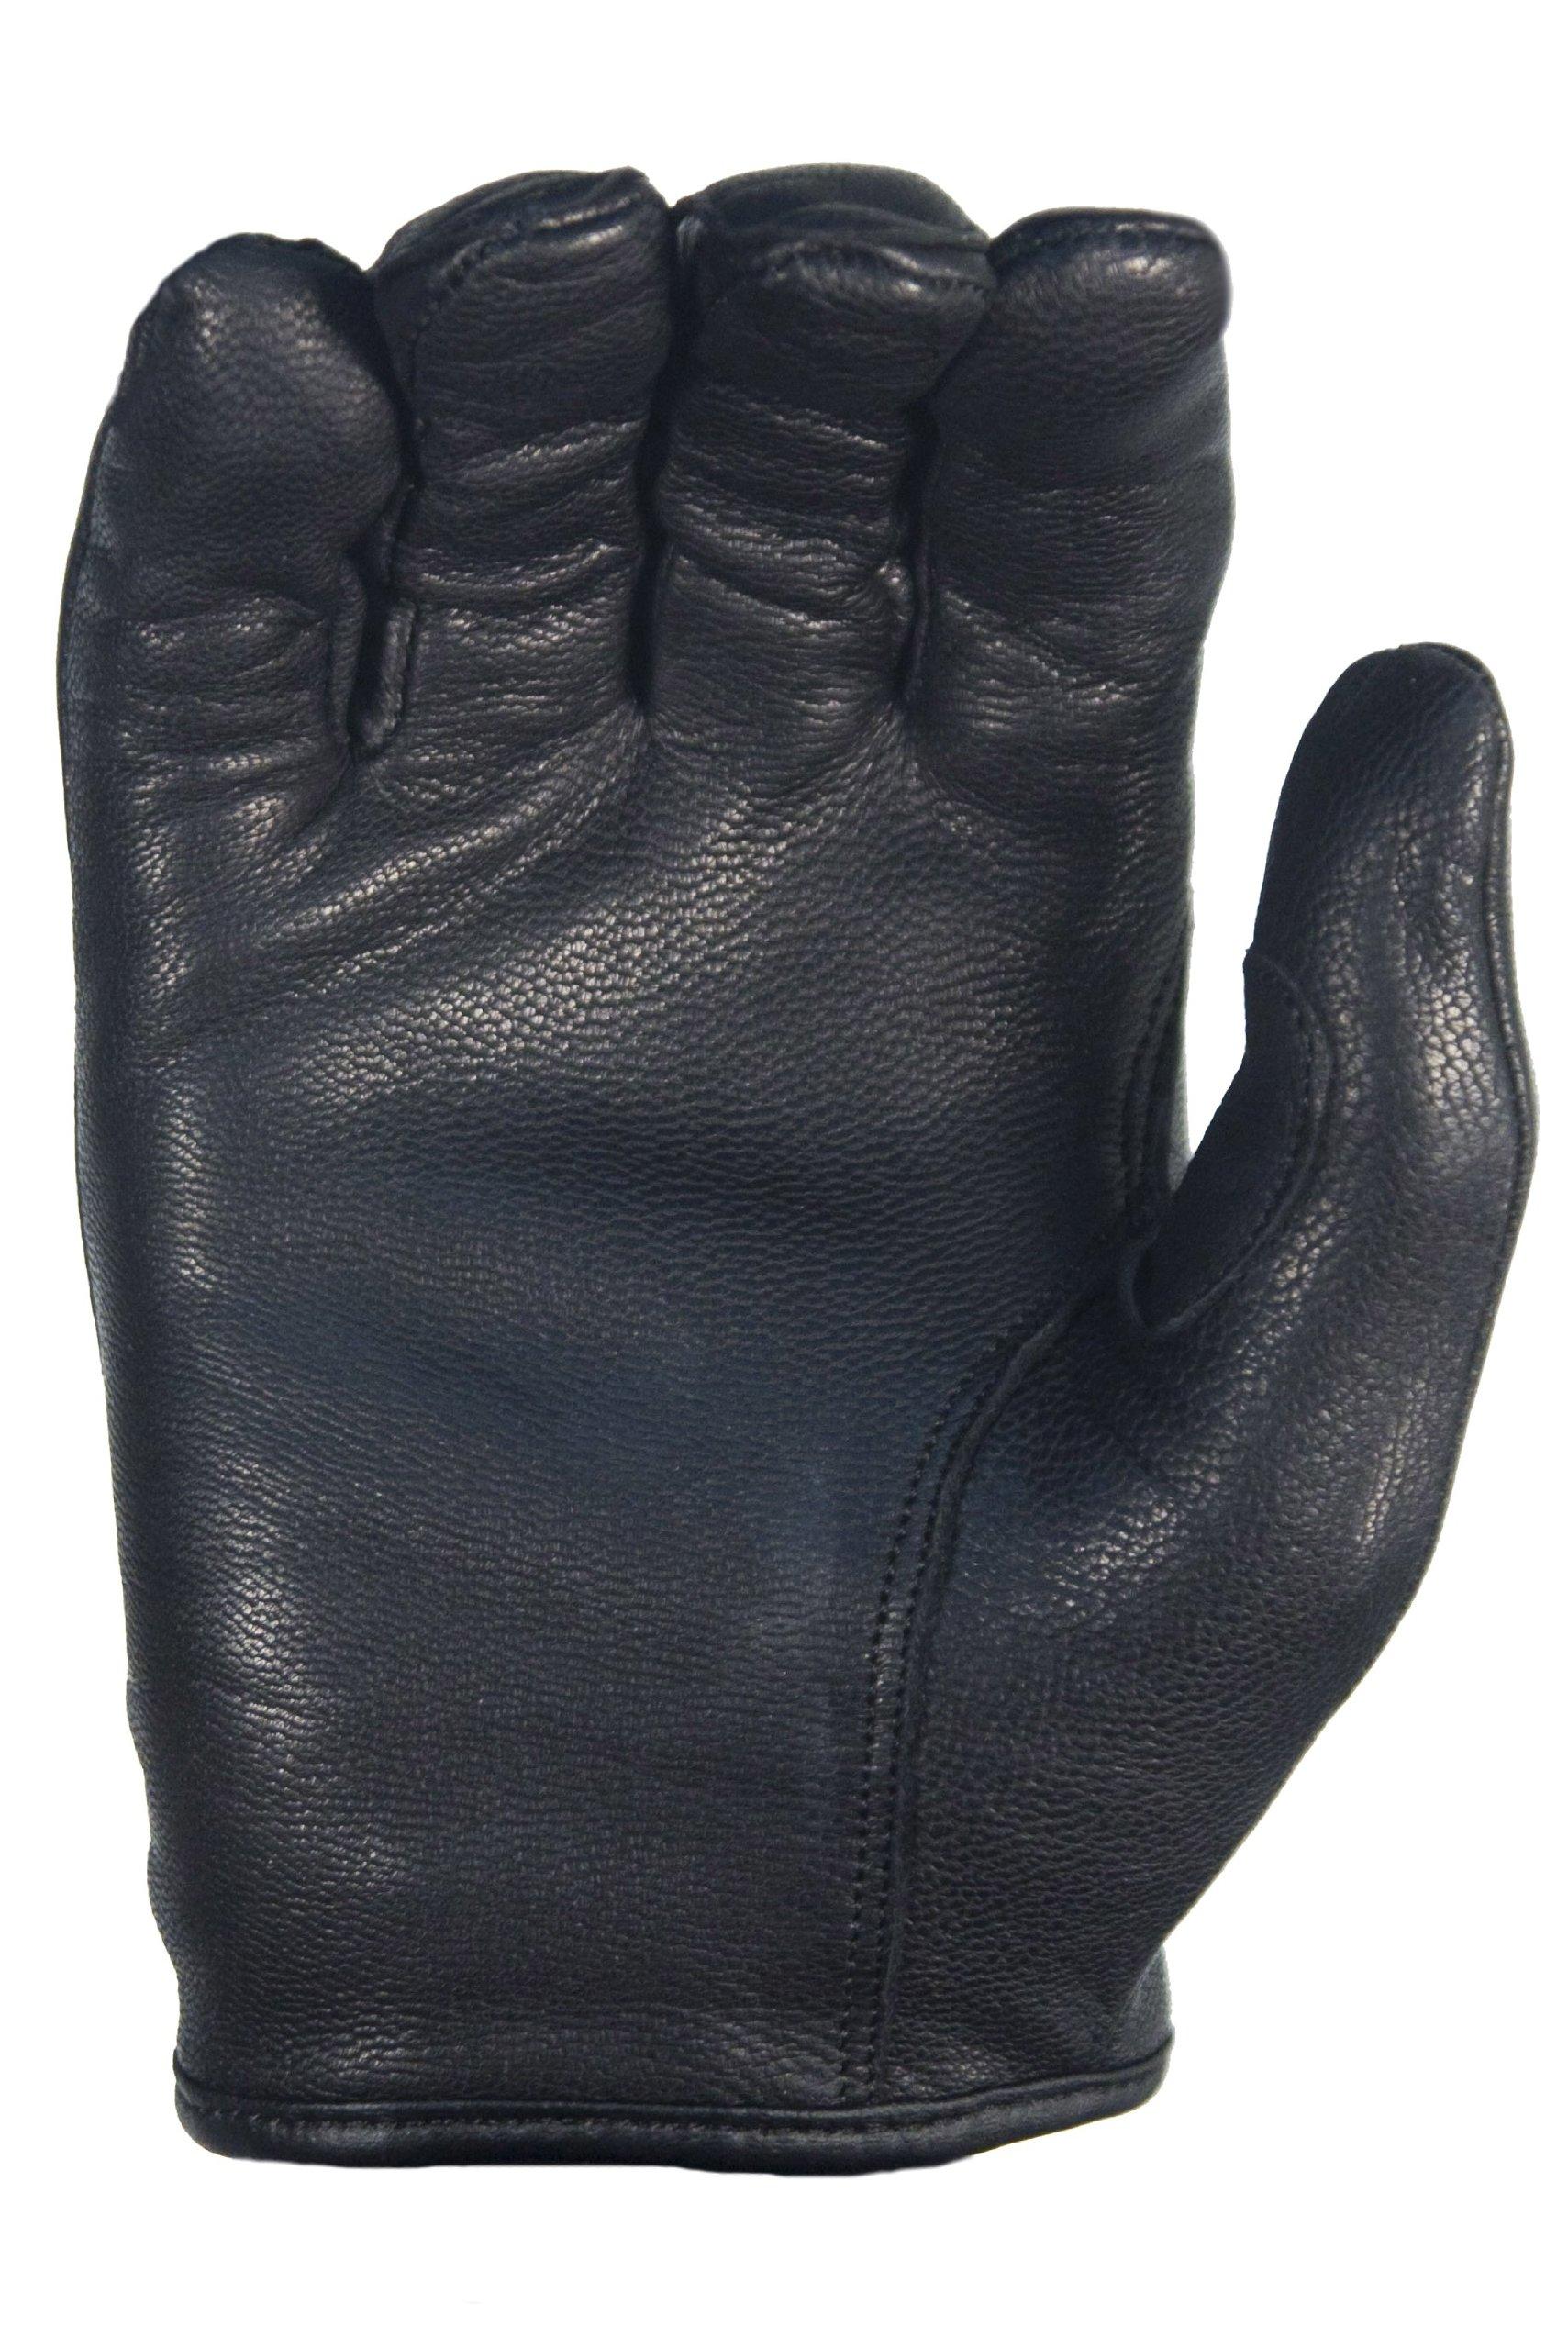 HWI Gear Kevlar Lined Leather Duty Glove, Large, Black by ACK, LLC